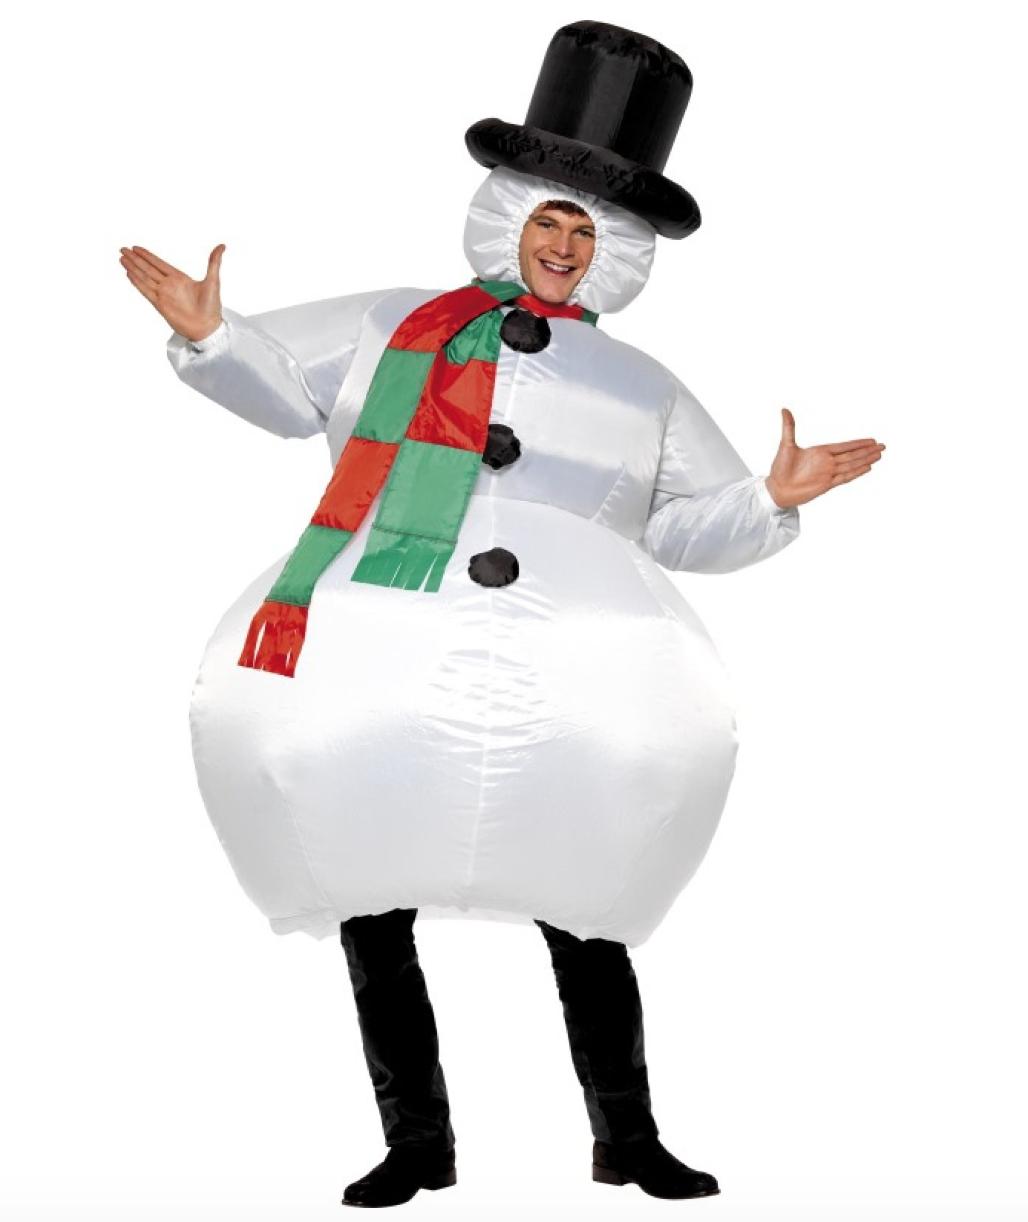 Oppustelig snemand kostume - KostumeUniverset